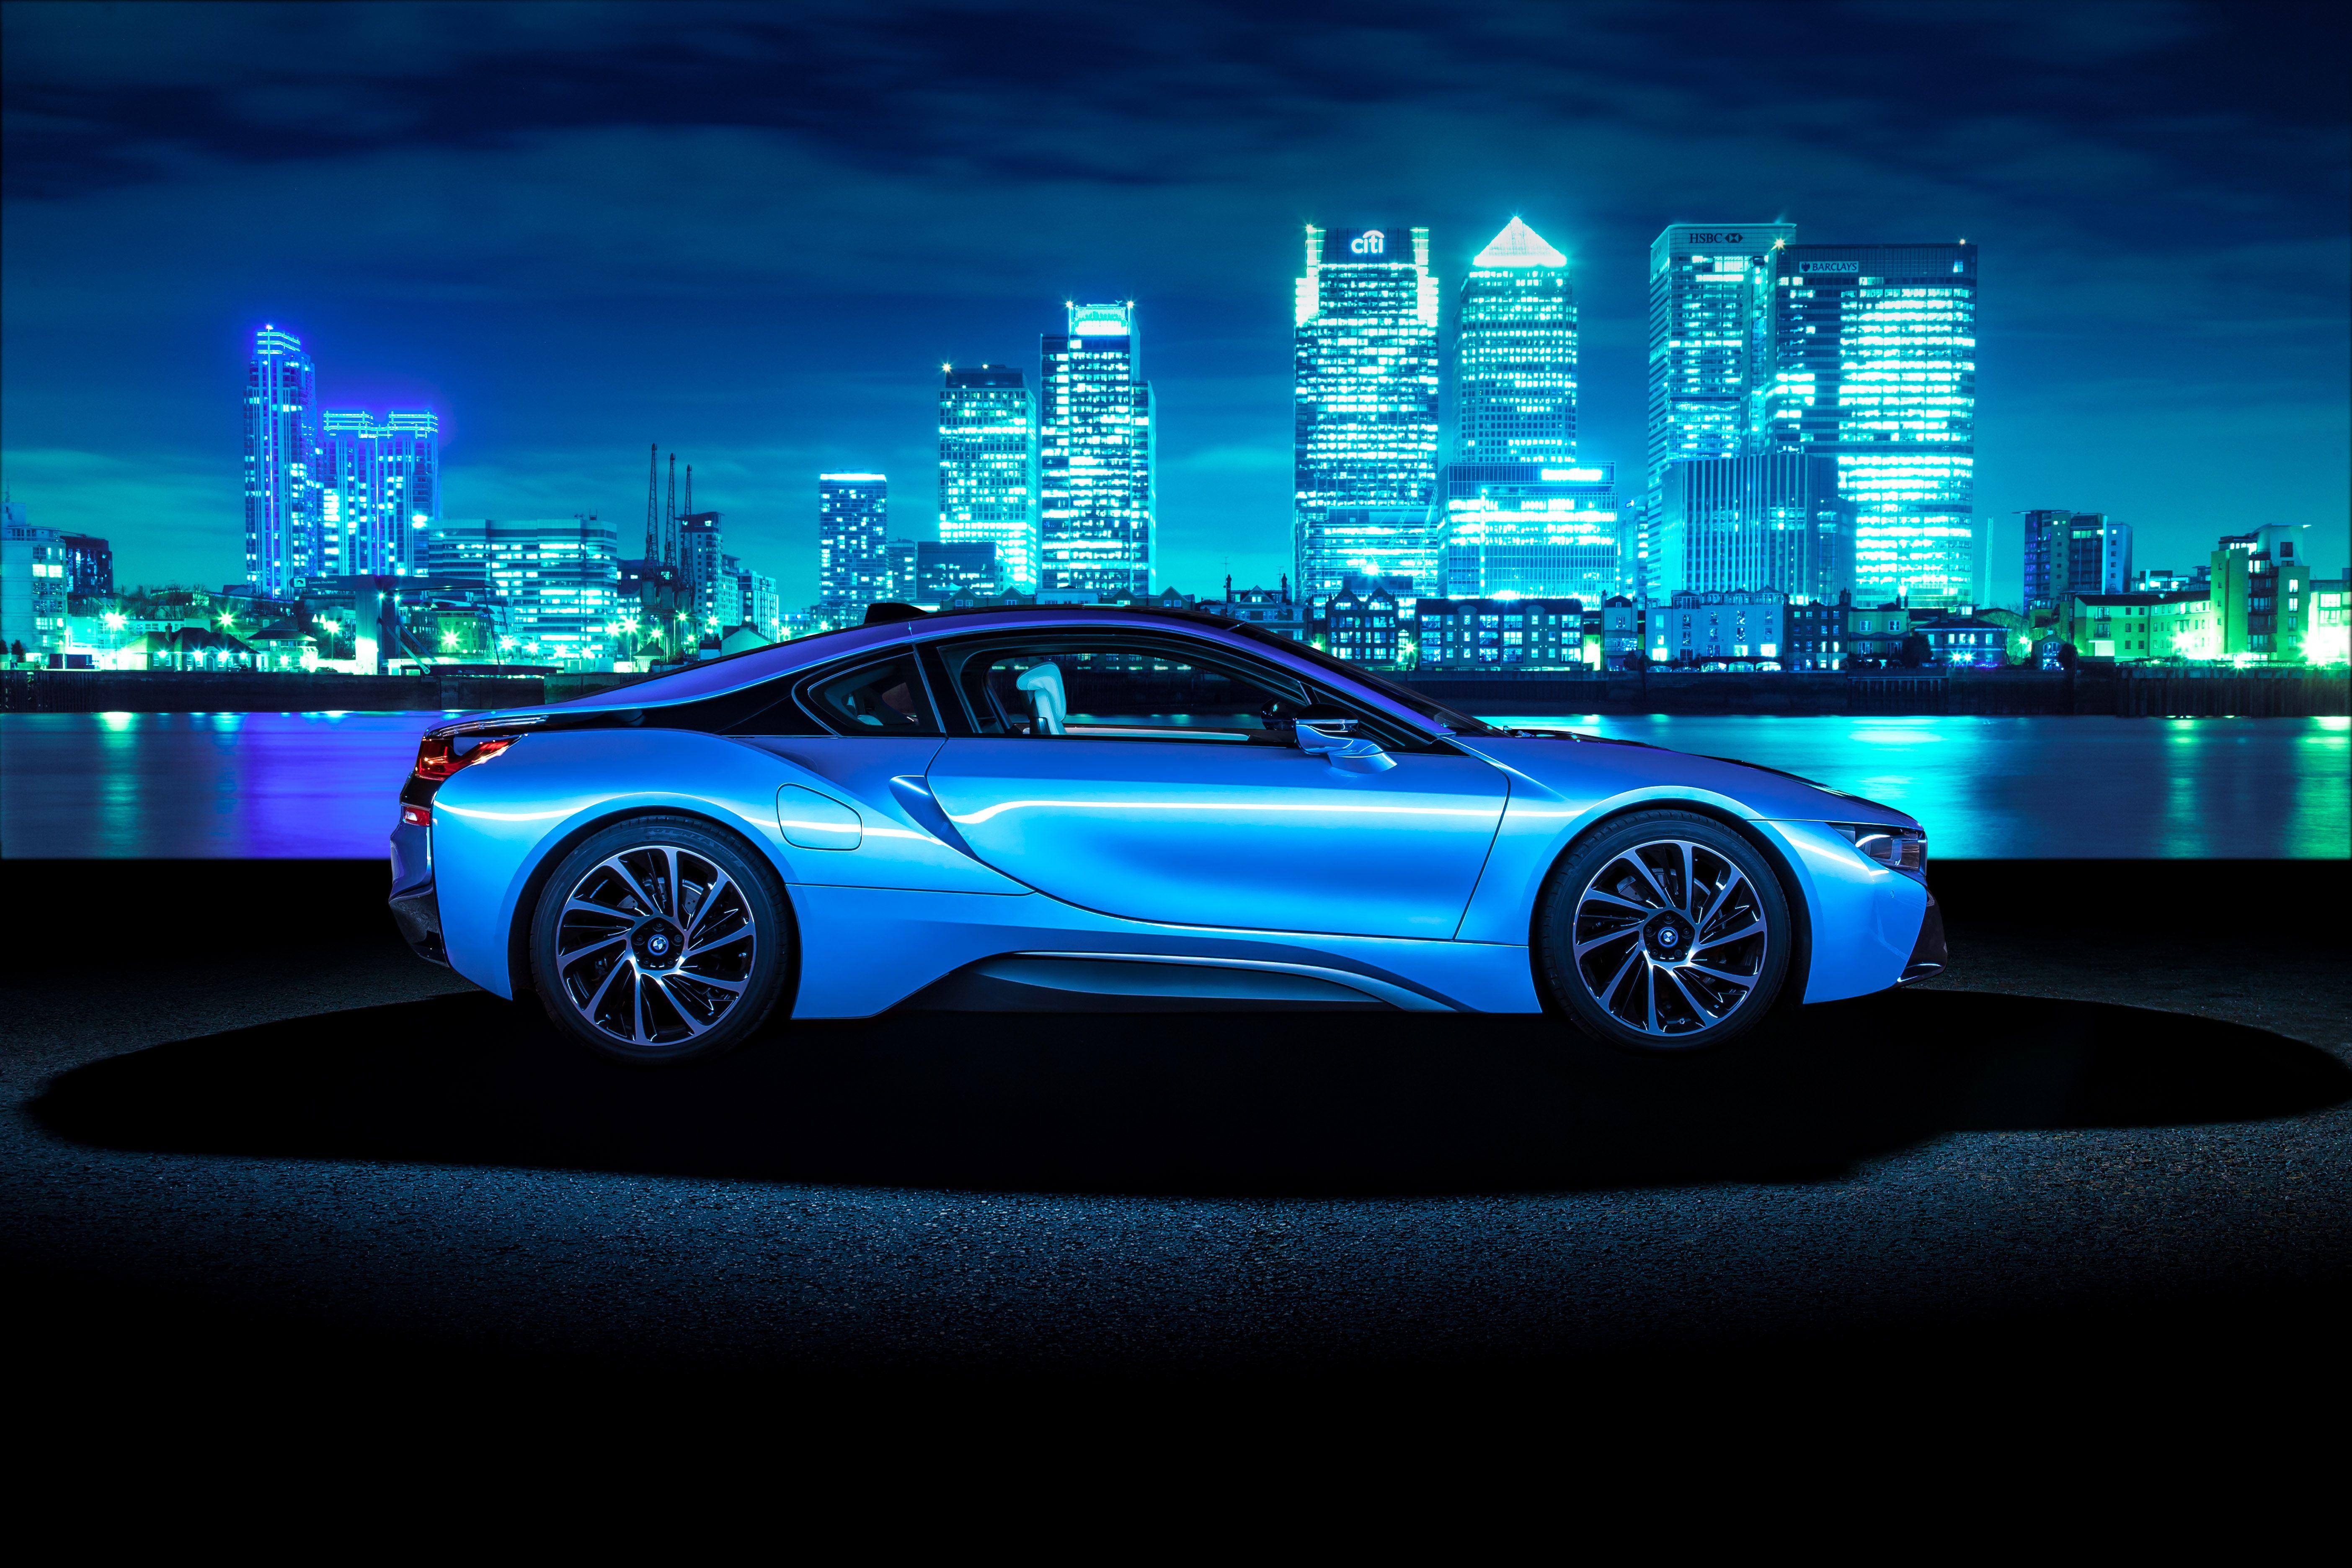 BMW i8 bylo zvoleno jako Auto roku renomovaným časopisem Top Gear. Gratulujeme!